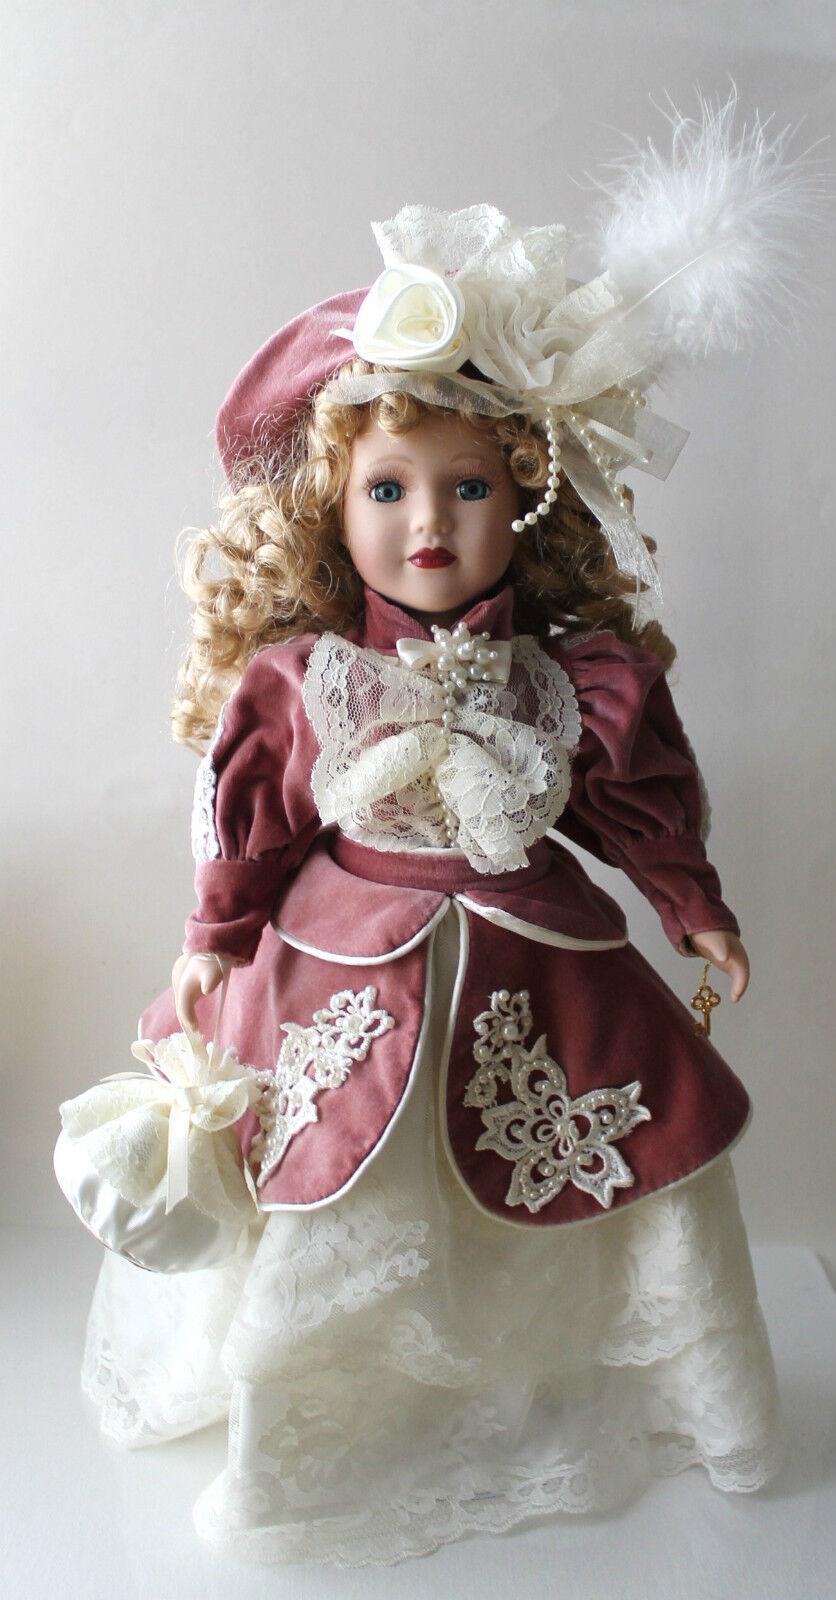 1999 Camellia Garden Collection Brass Brass Collection Key Victorian Porcelain Doll beebf5